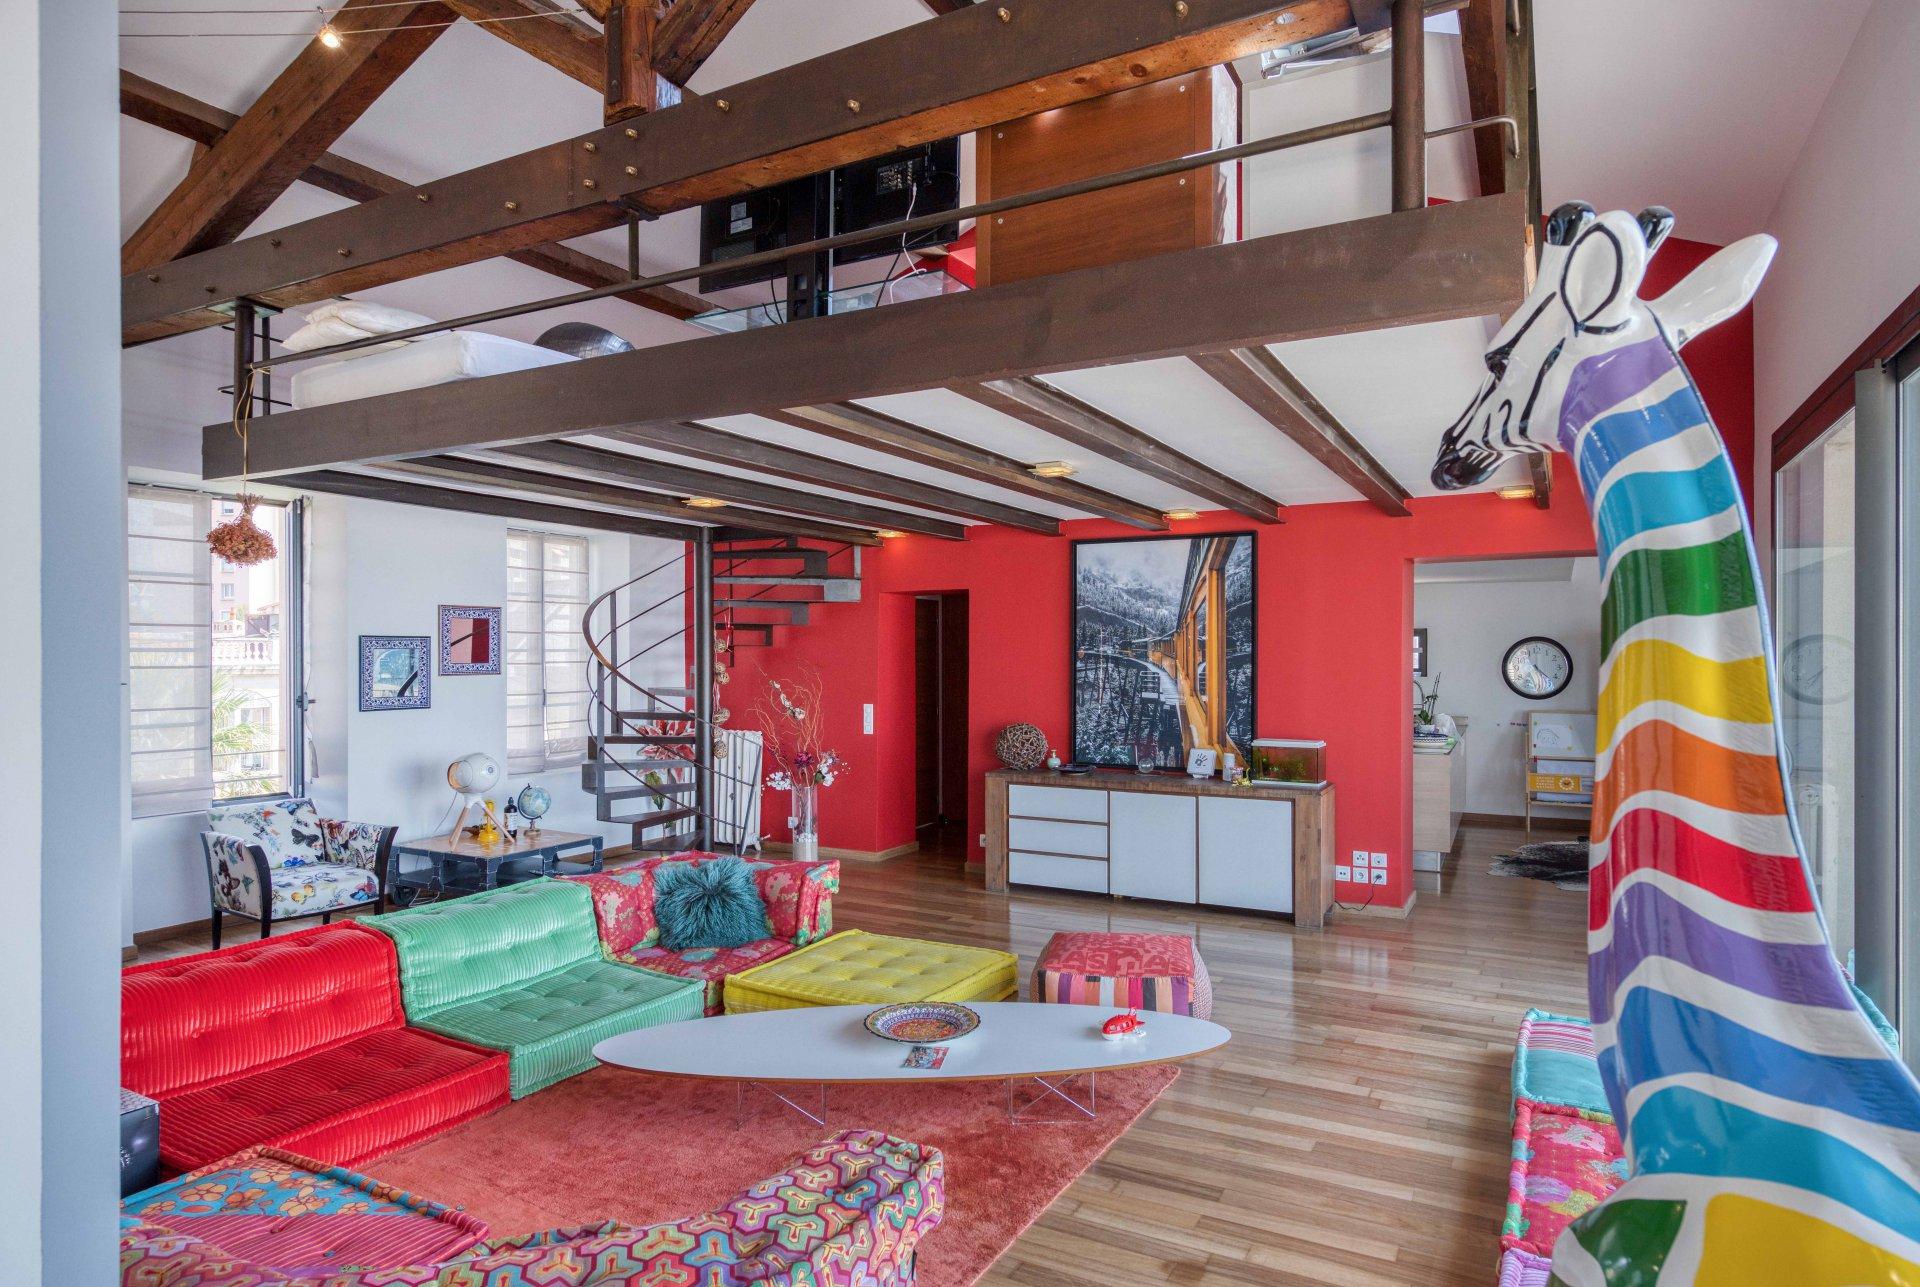 magnifique-hotel-particulier-renove-a-vendre-terrasse-piscine-cave-garage-studio